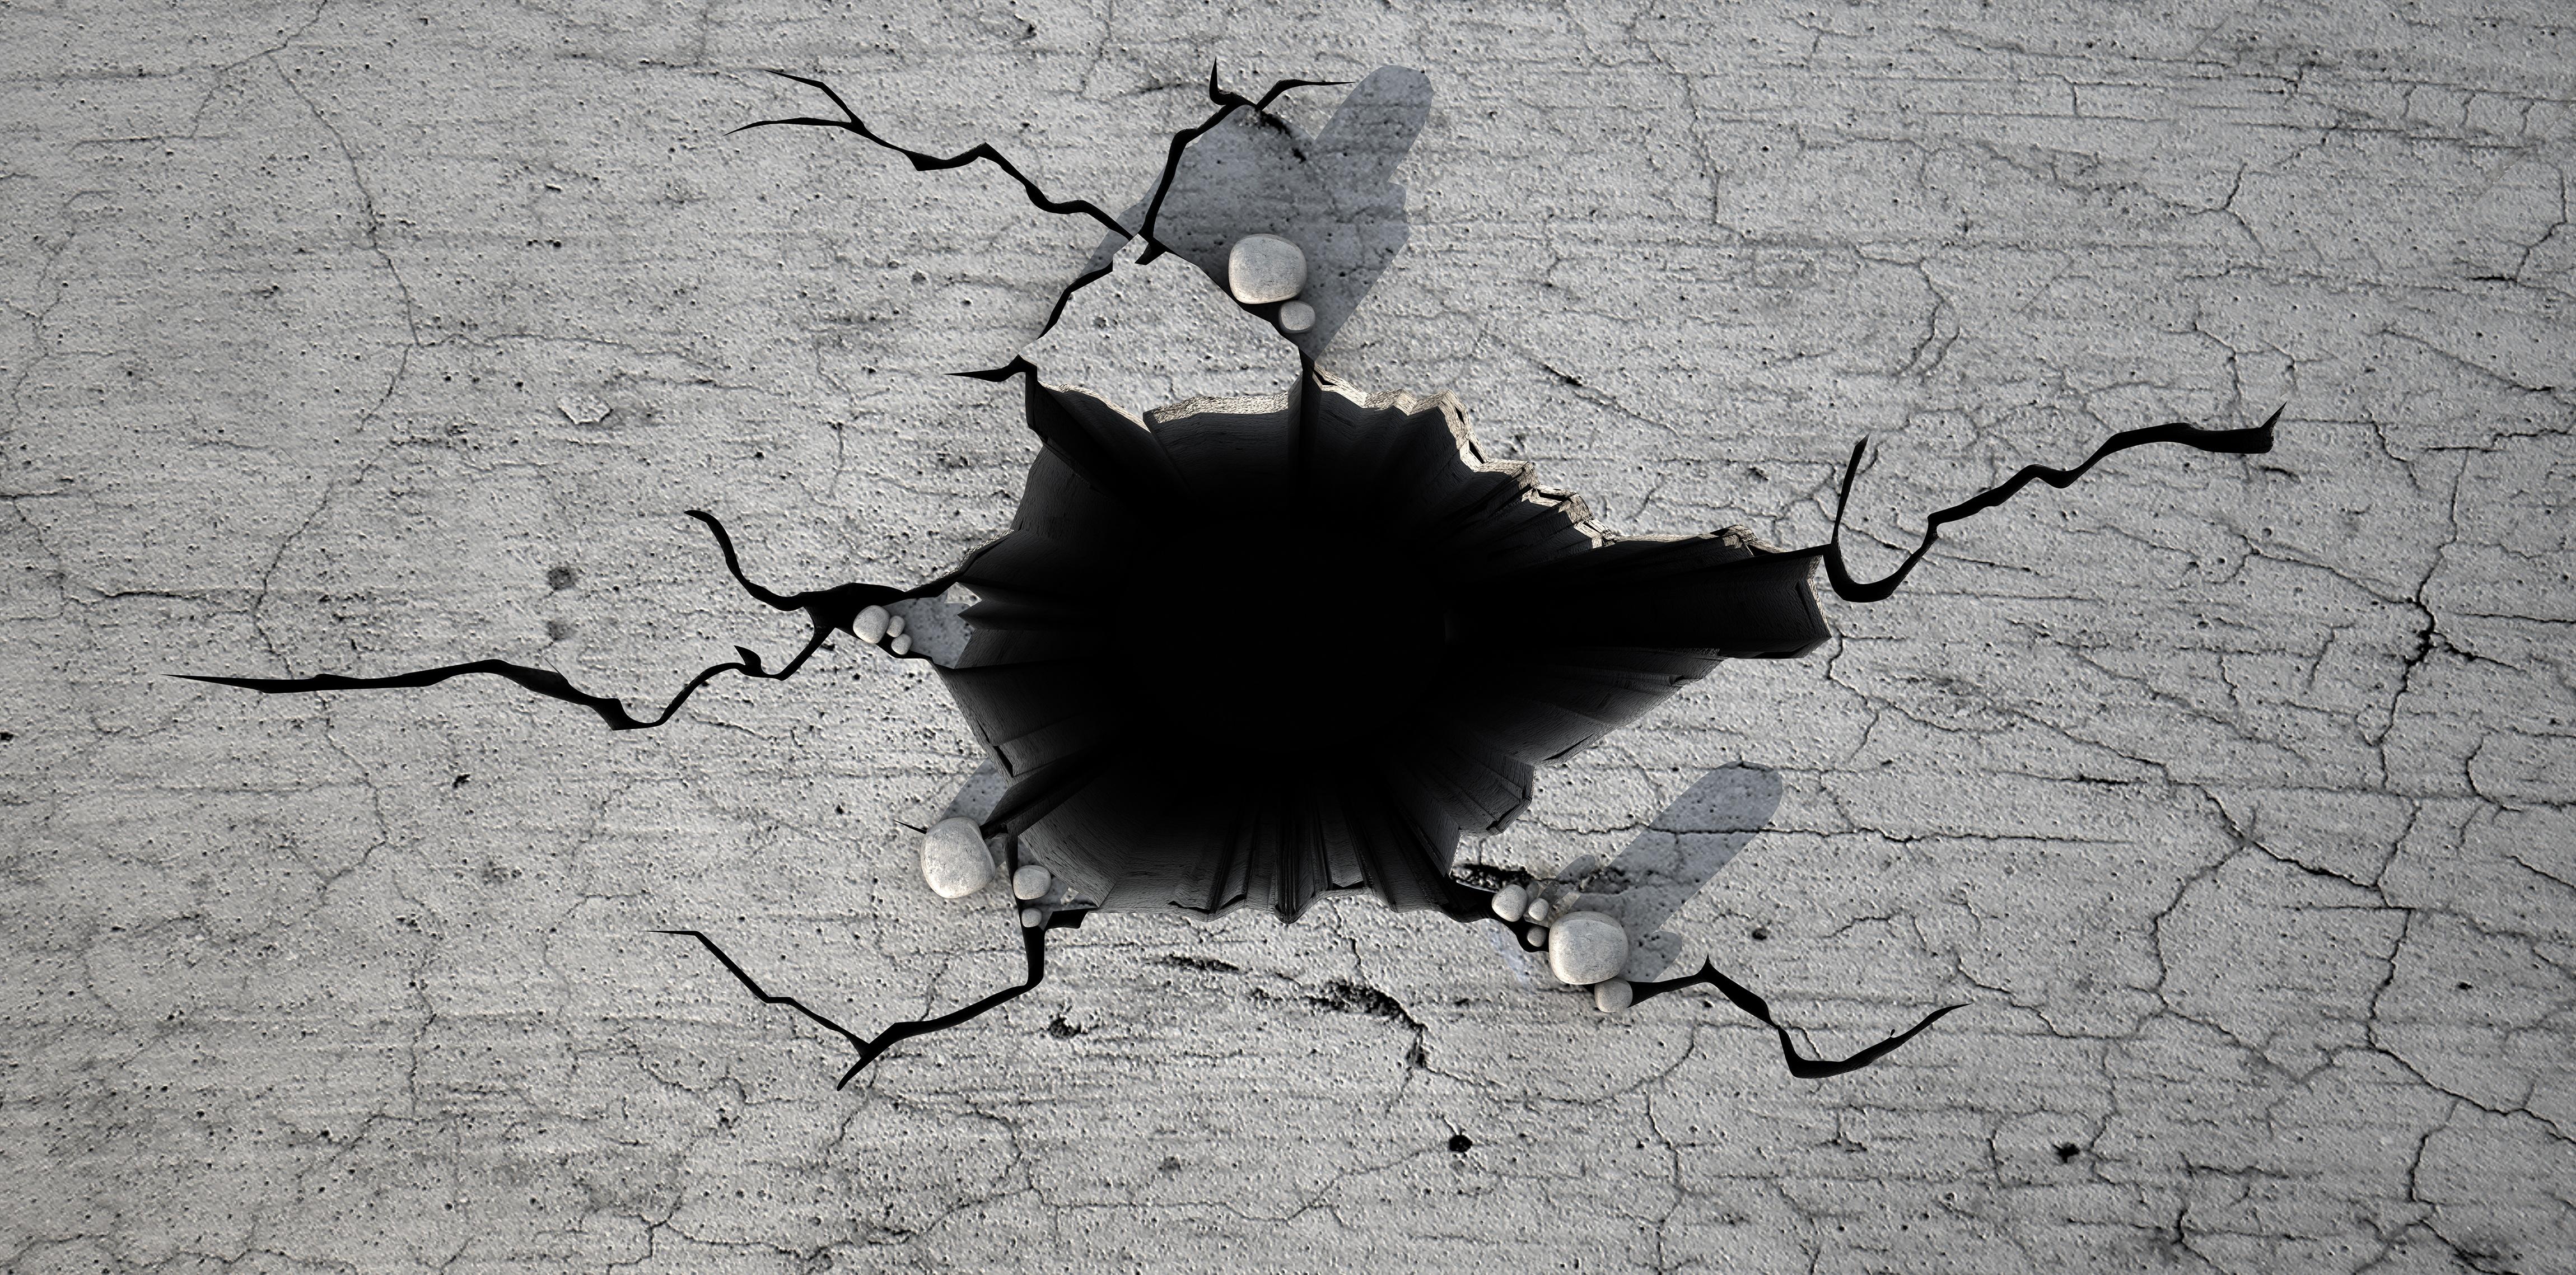 falling-through-the-cracks-1.jpg